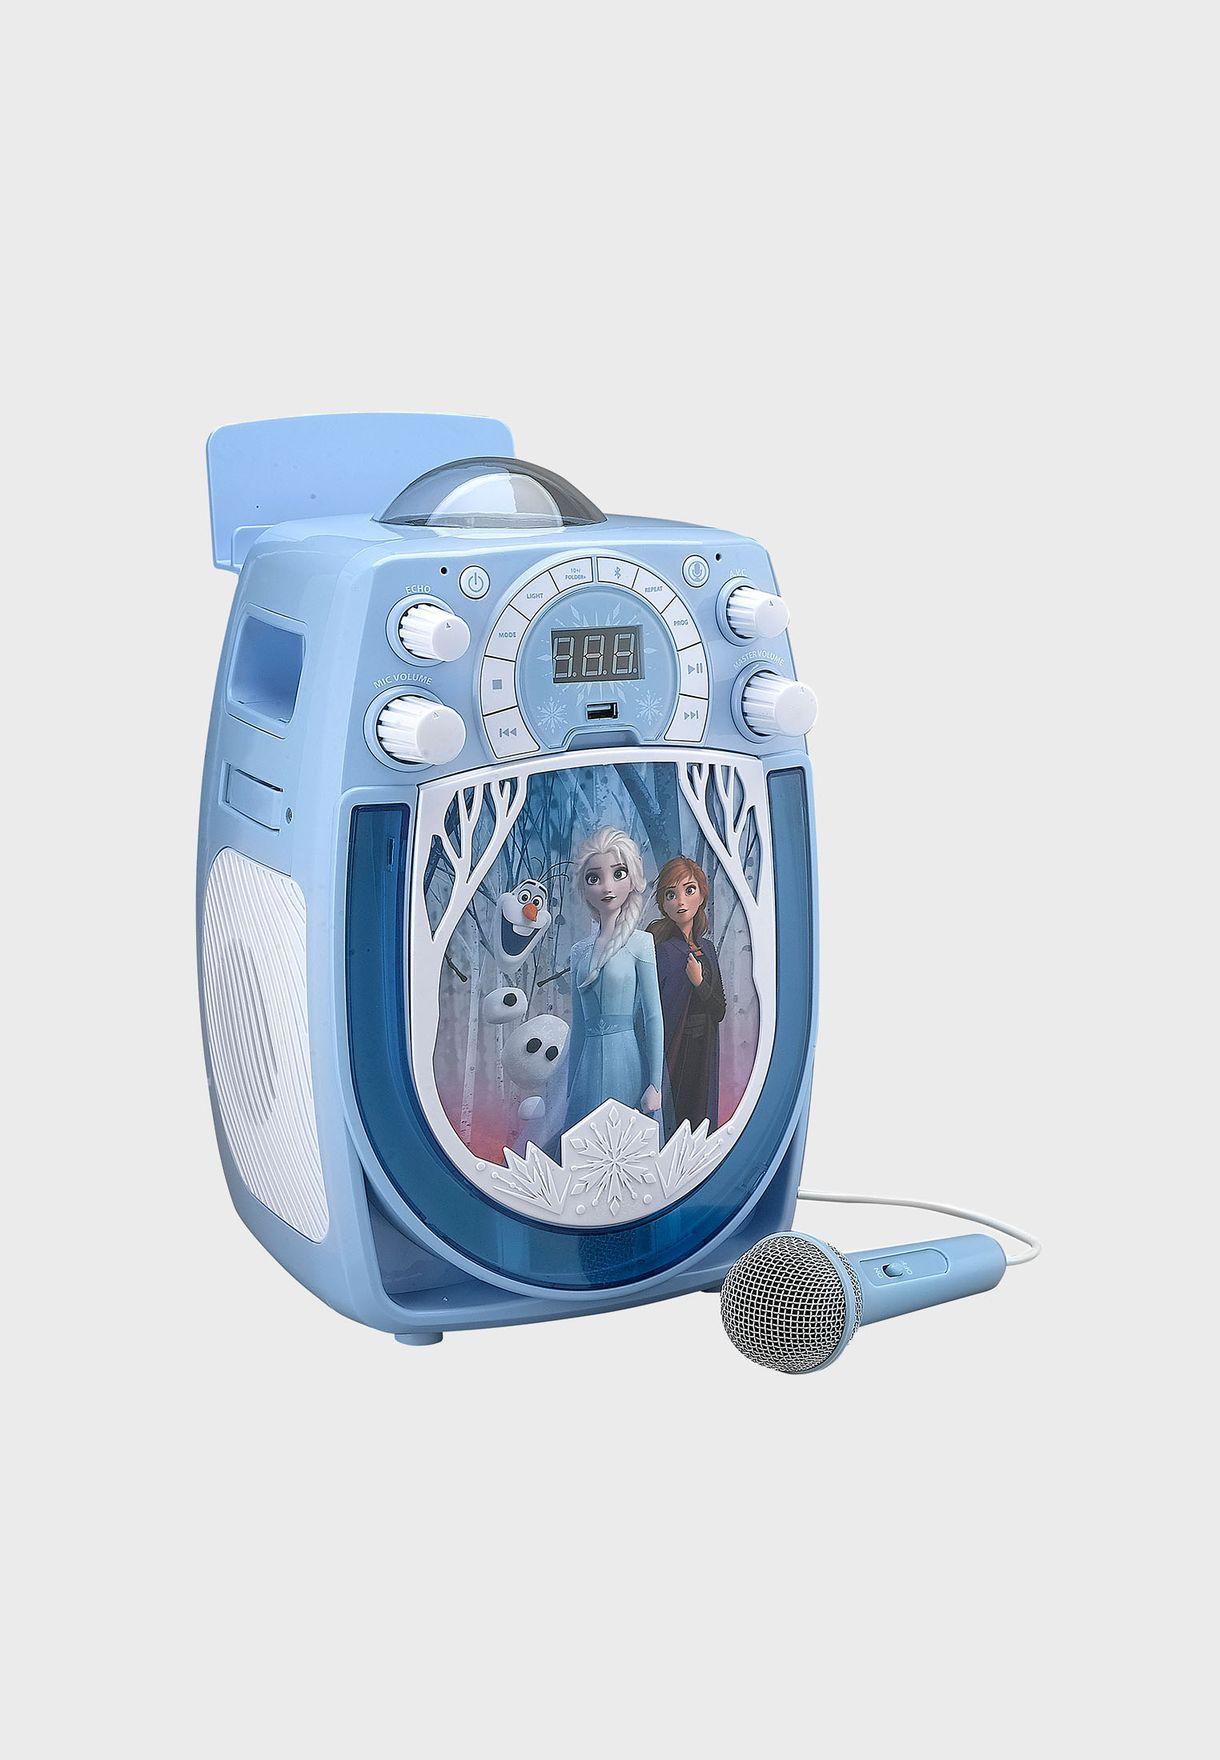 Frozen Karaoke With Snowflake Projector & Microphone